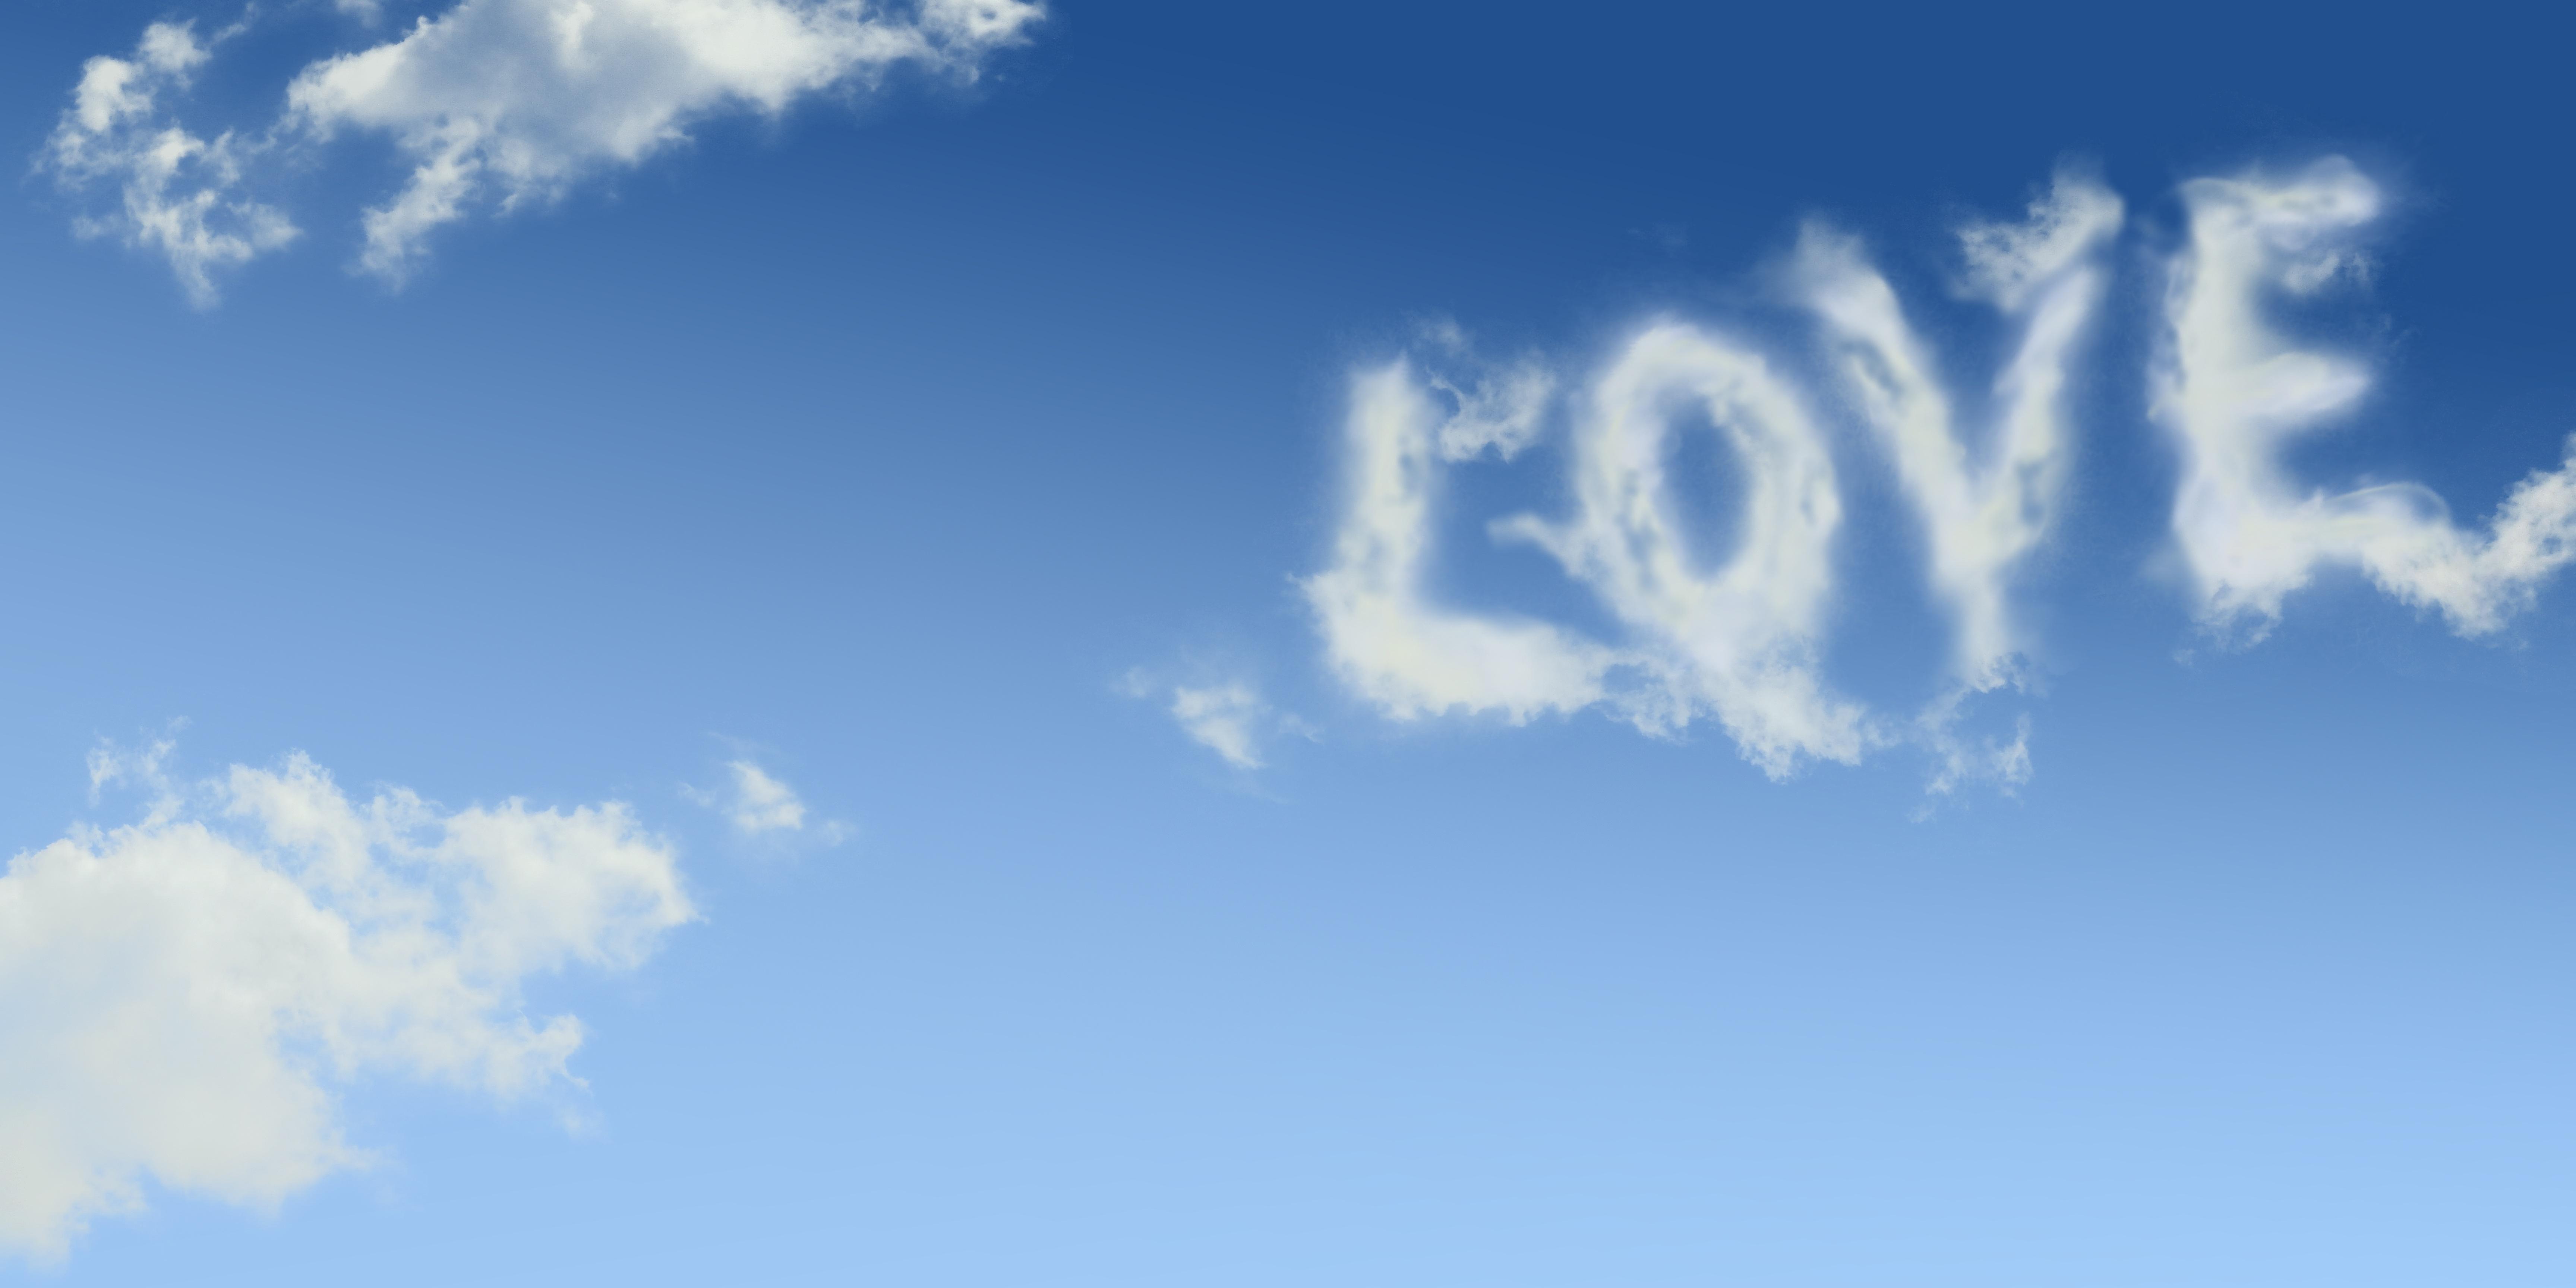 free images   horizon  cloud  sky  sunlight  daytime  love  cumulus  romance  romantic  blue